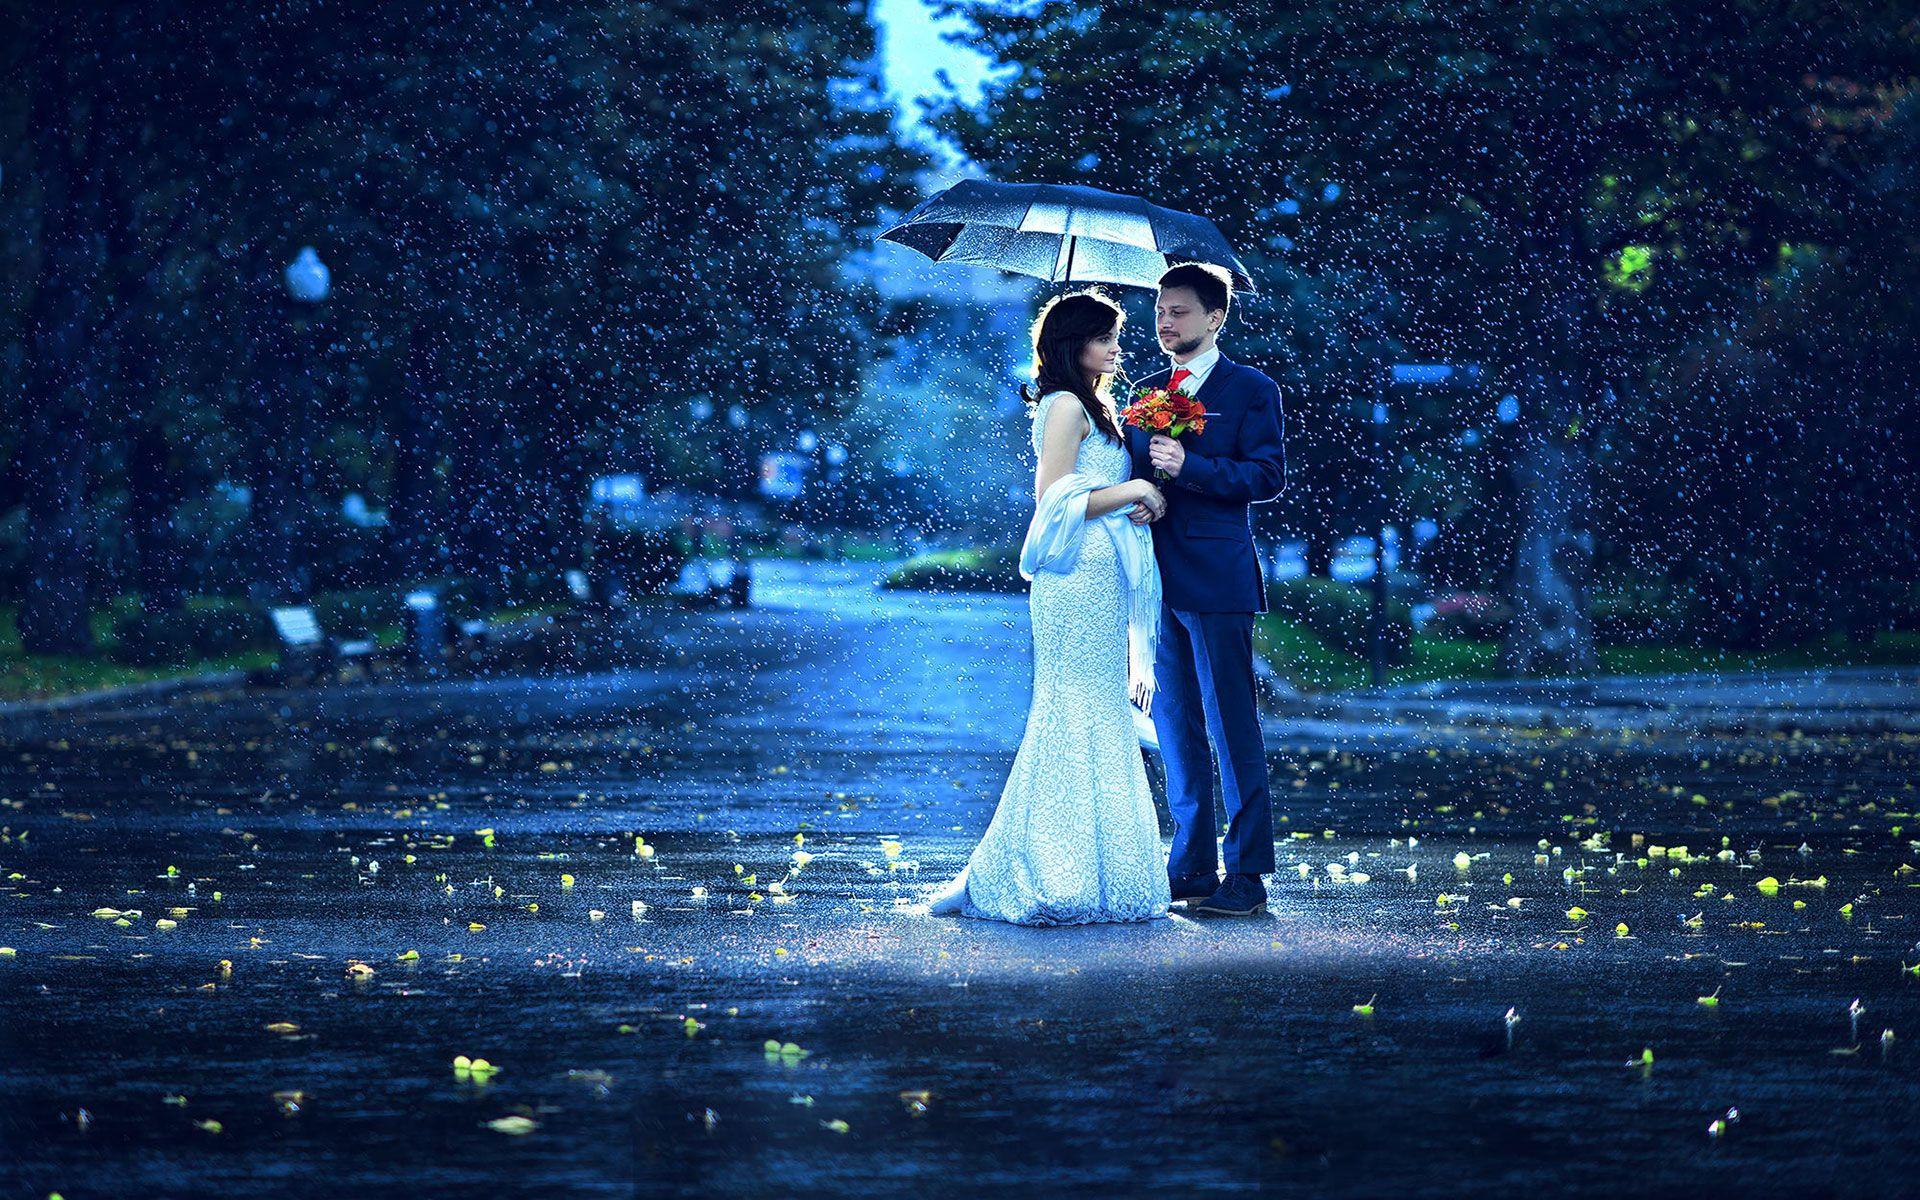 romantic rainy wallpaper - photo #10